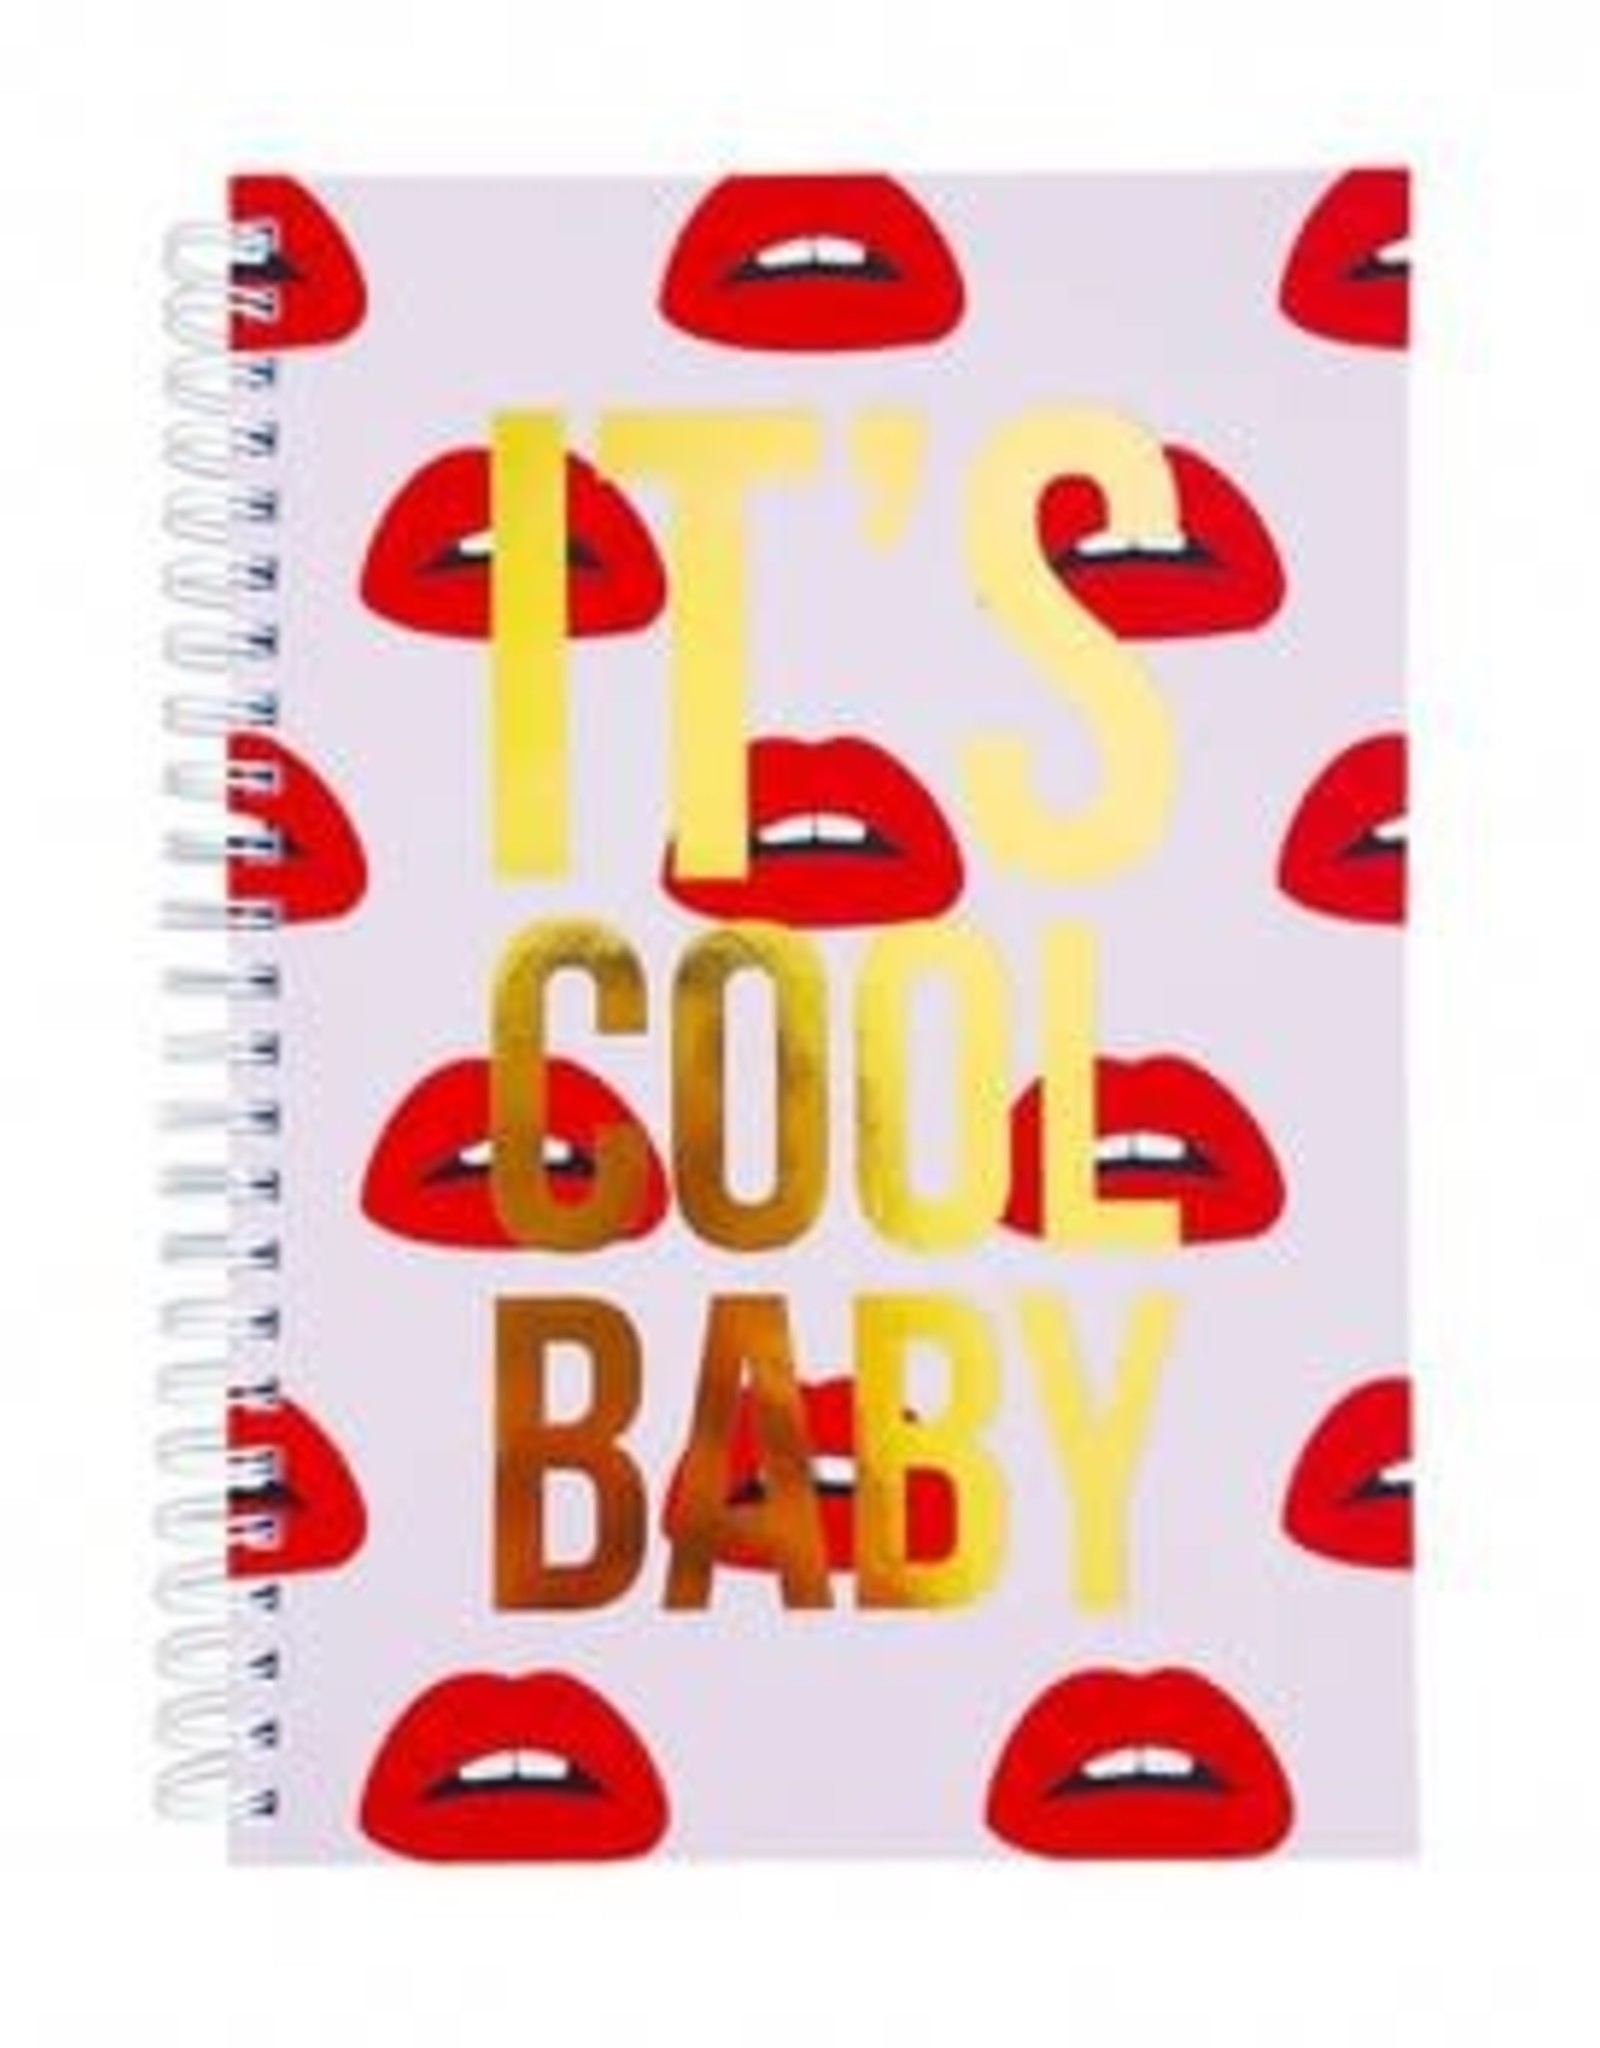 studio stationery Studio stationery notebook it's cool baby